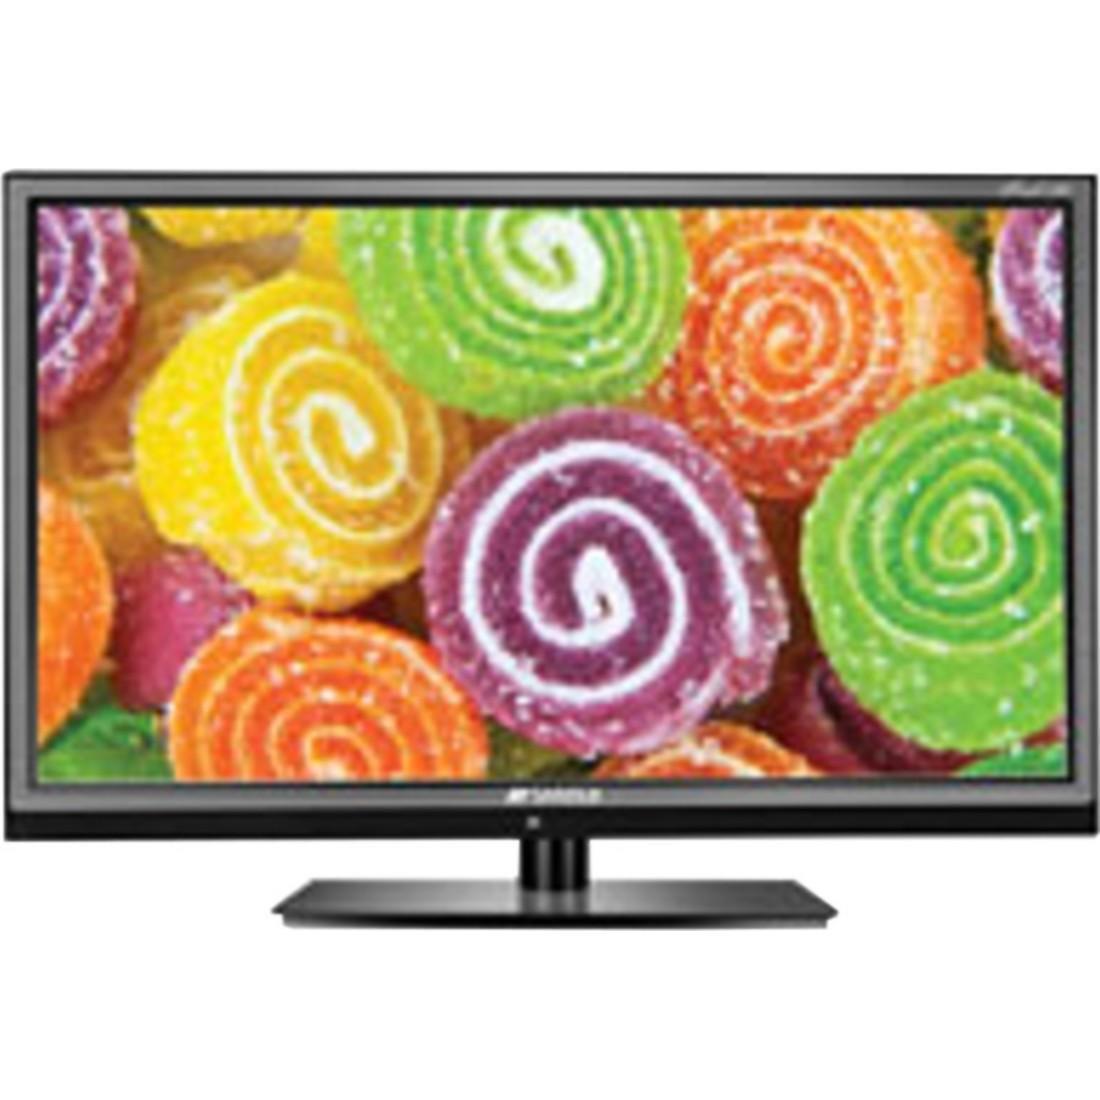 Sansui SJX40FB09XAF 98 cm (39) LED TV (Full HD) Image